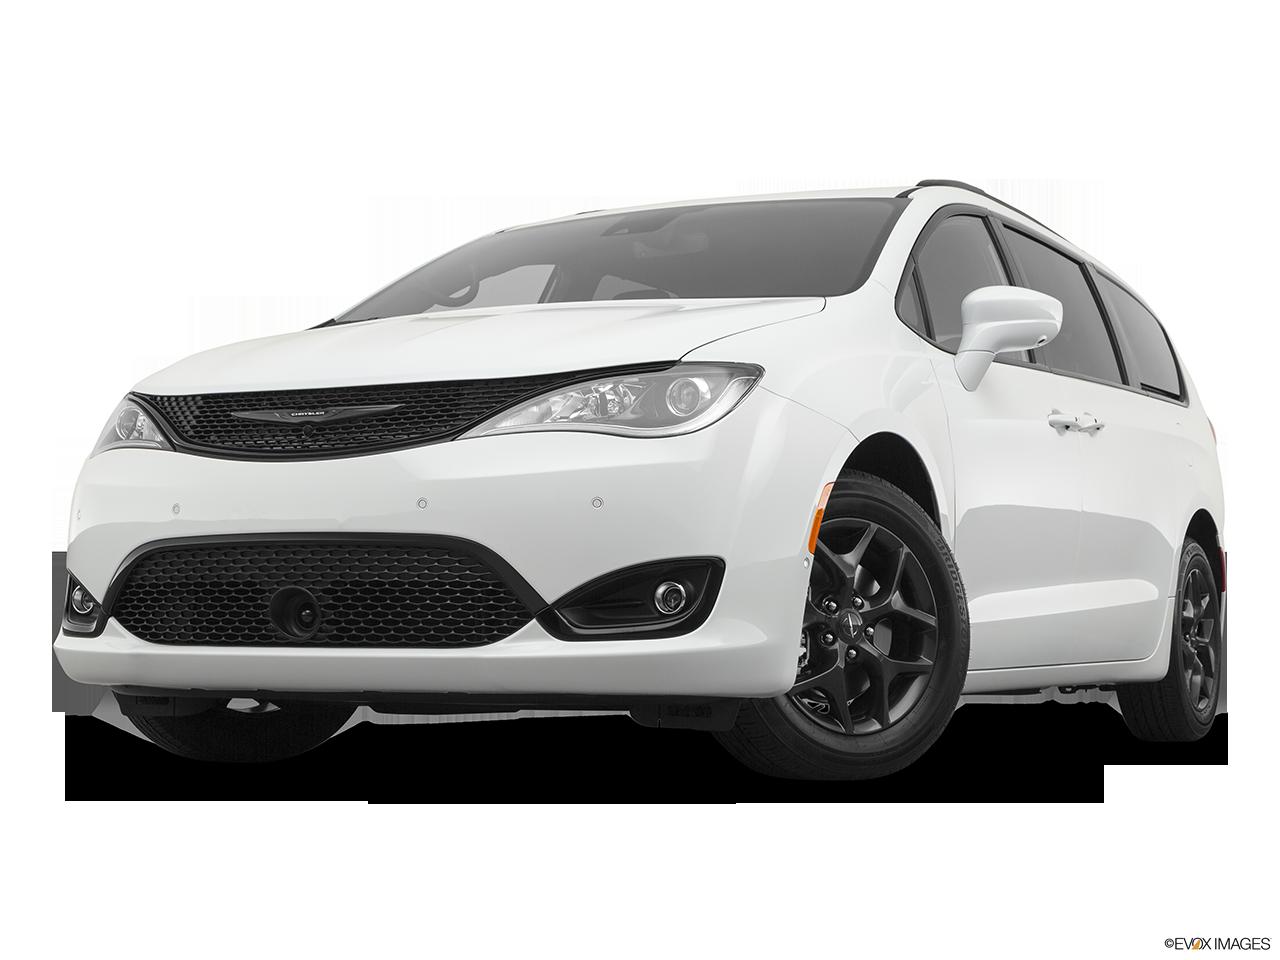 2021 Chrysler Pacifica photo